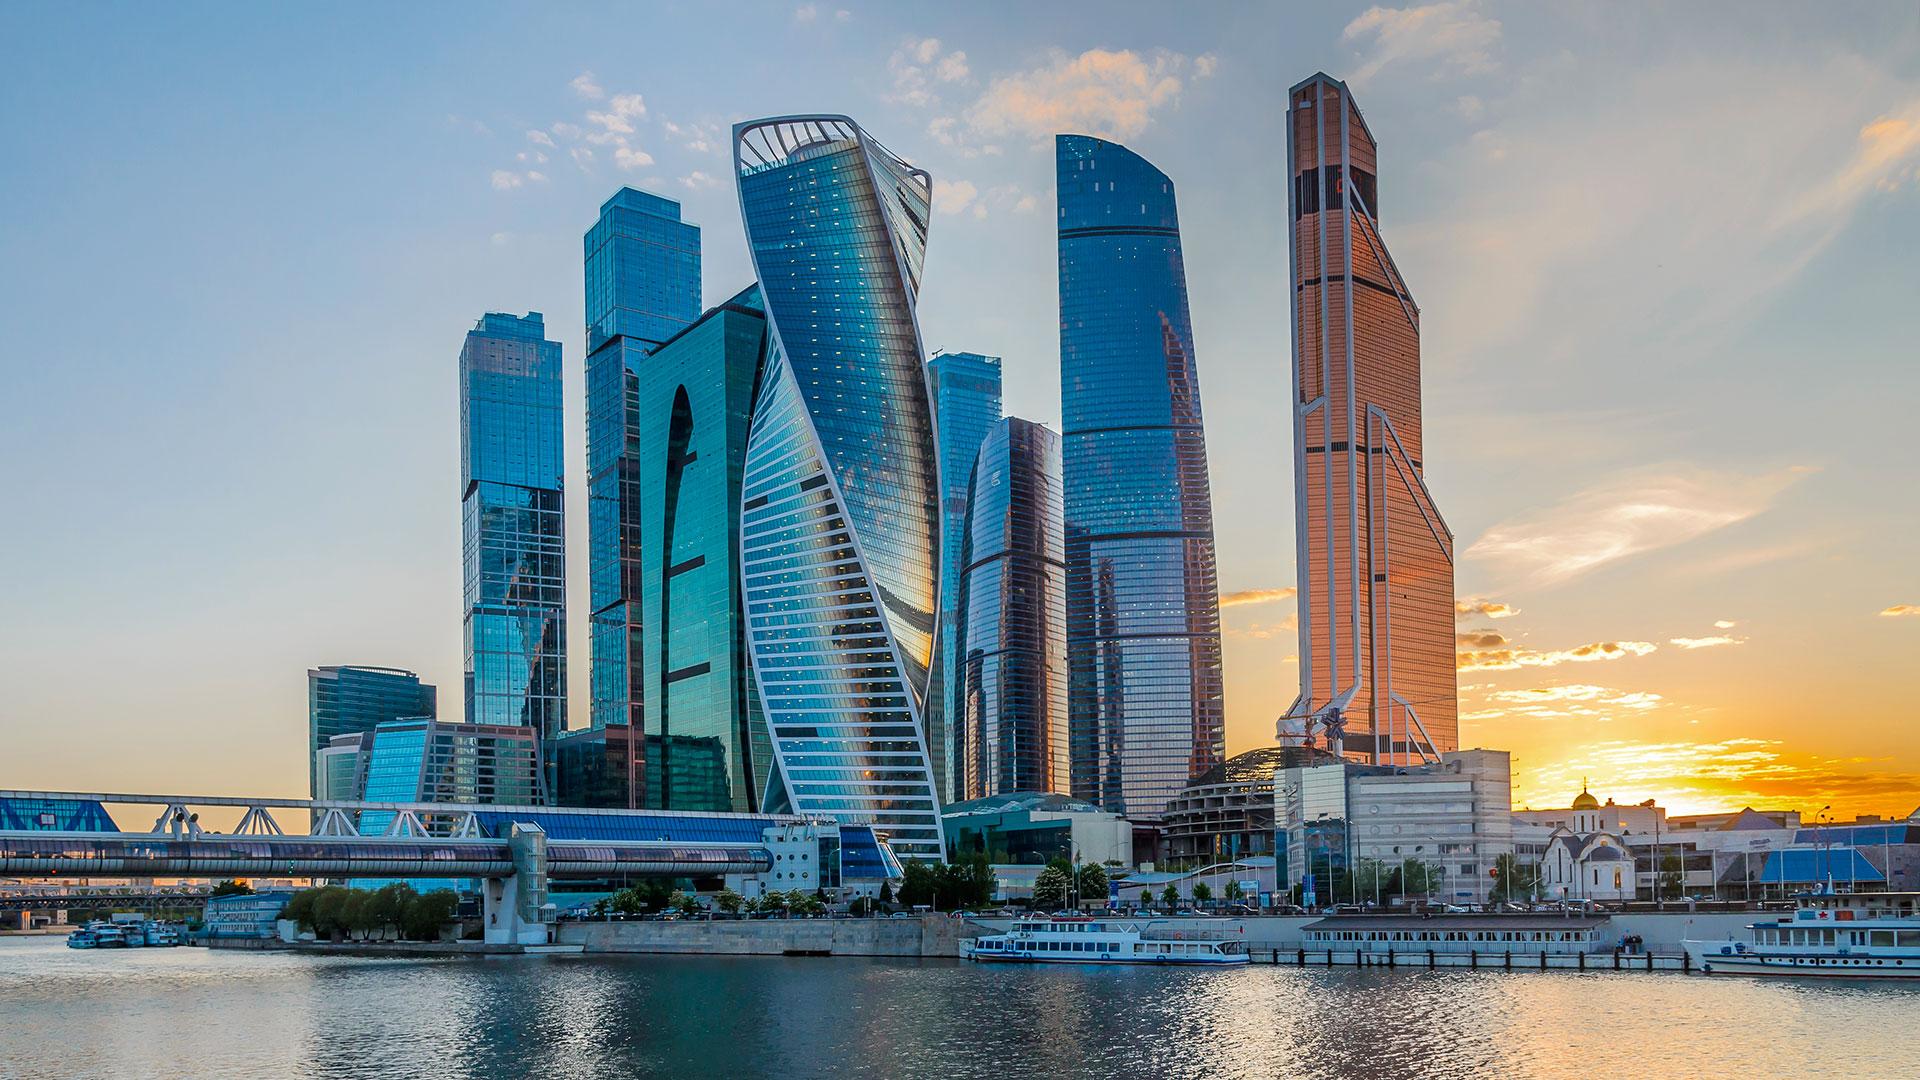 Costruzioni Mosca